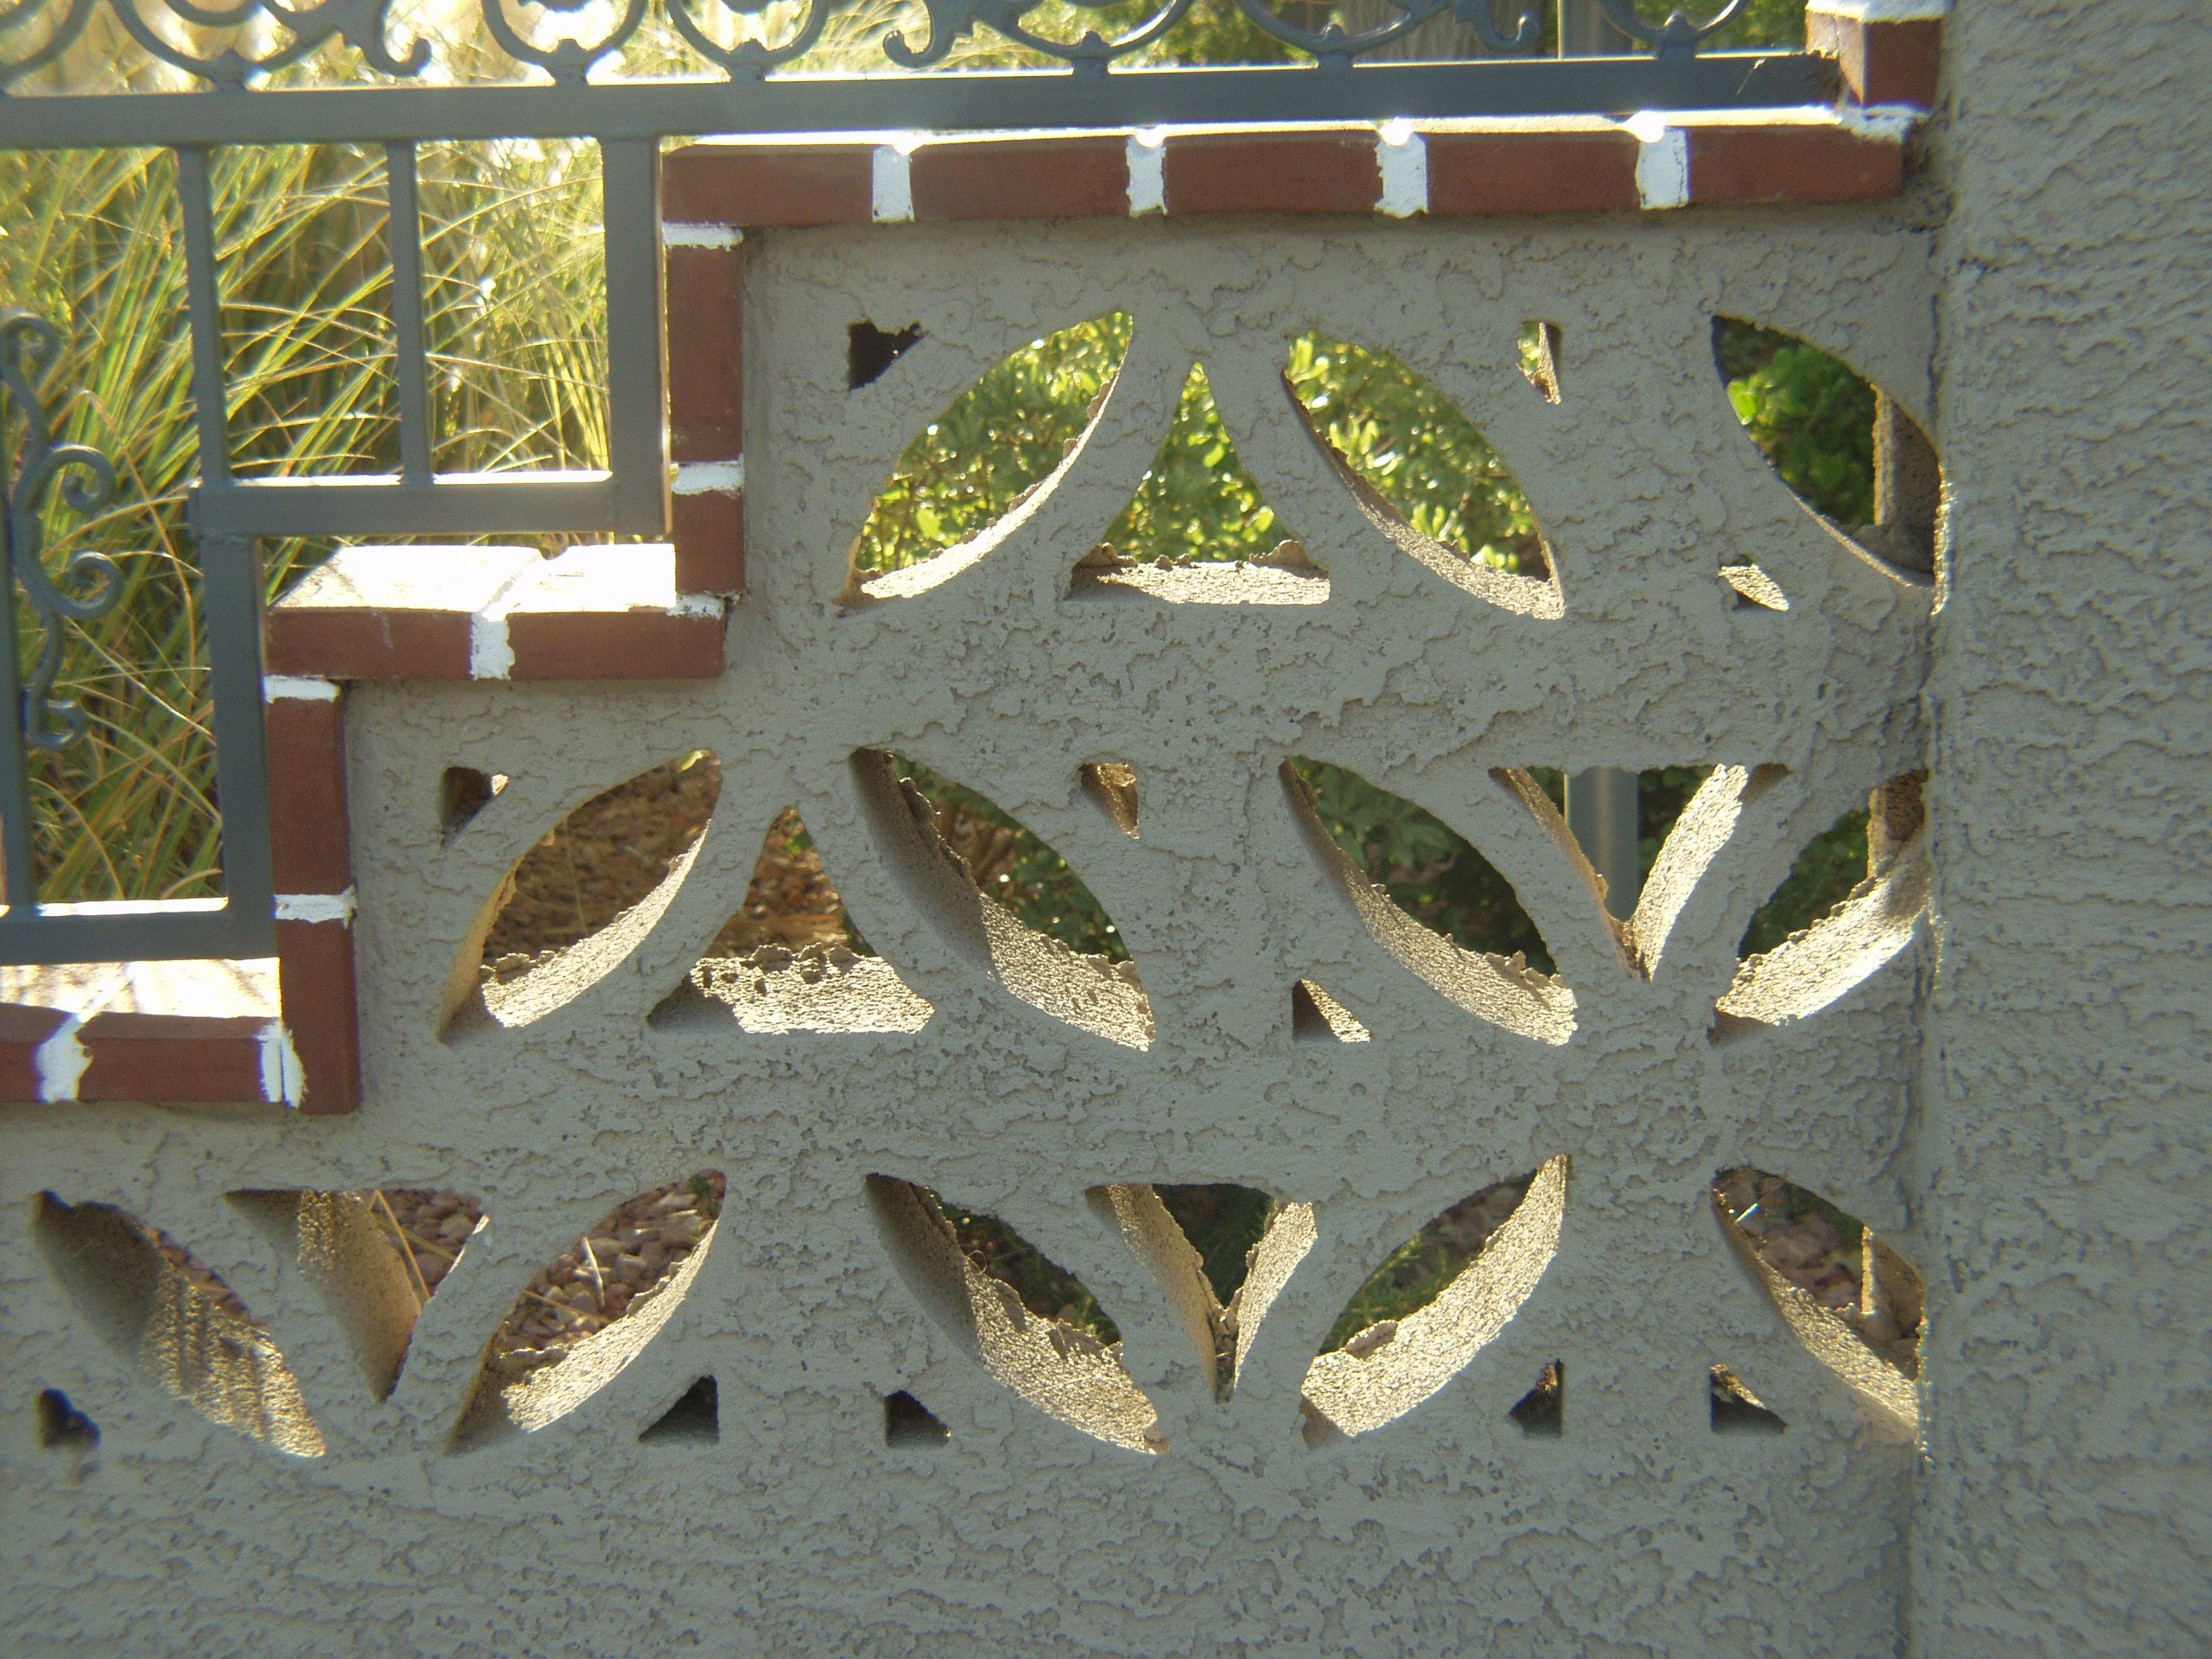 screen block palms paradise for the decorative of sale concrete architecture img blocks decor